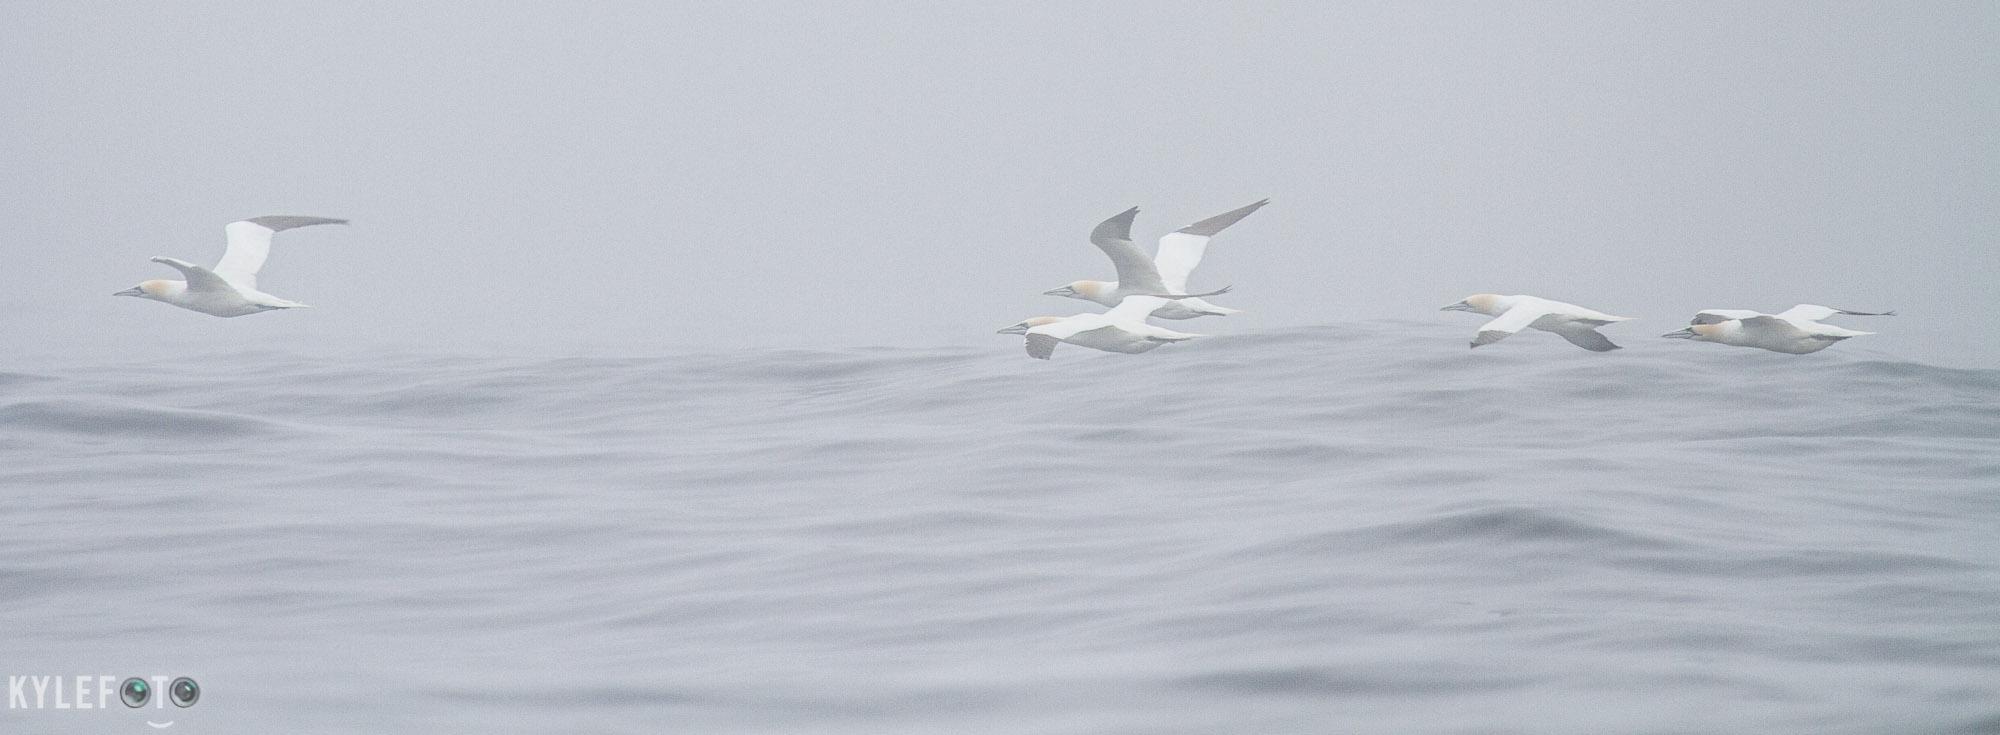 10Antecoste-Island-gannet06.jpg